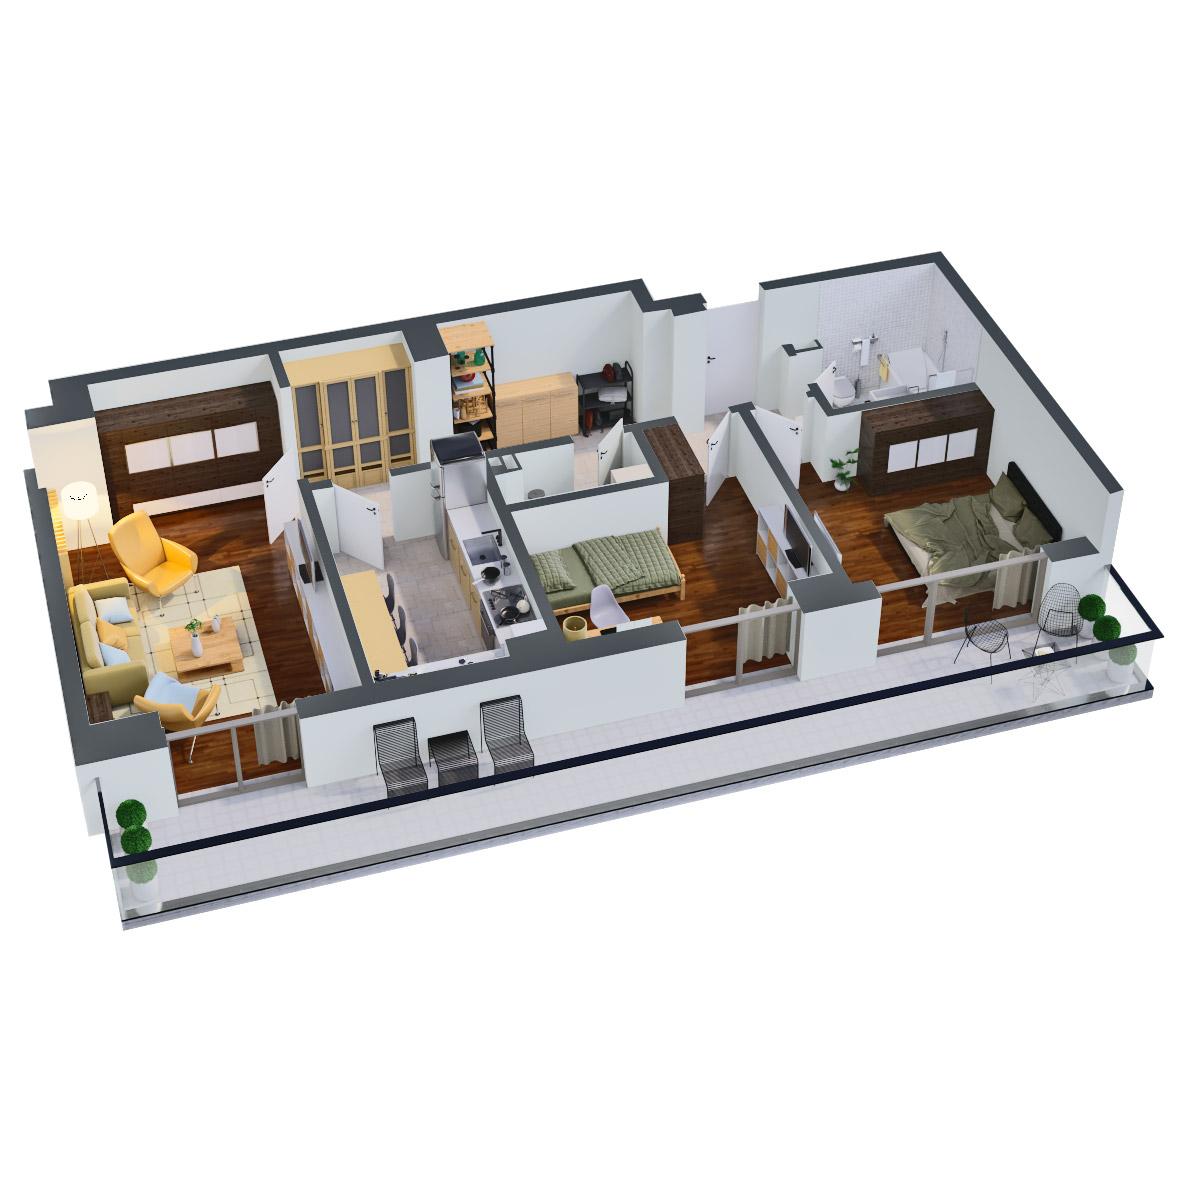 Apartament 3 camere de vanzare Bucuresti - Catedral Residence - Marriott, Piata Unirii, 13 Septembrie, Izvor - Tip 5 - T2 - C